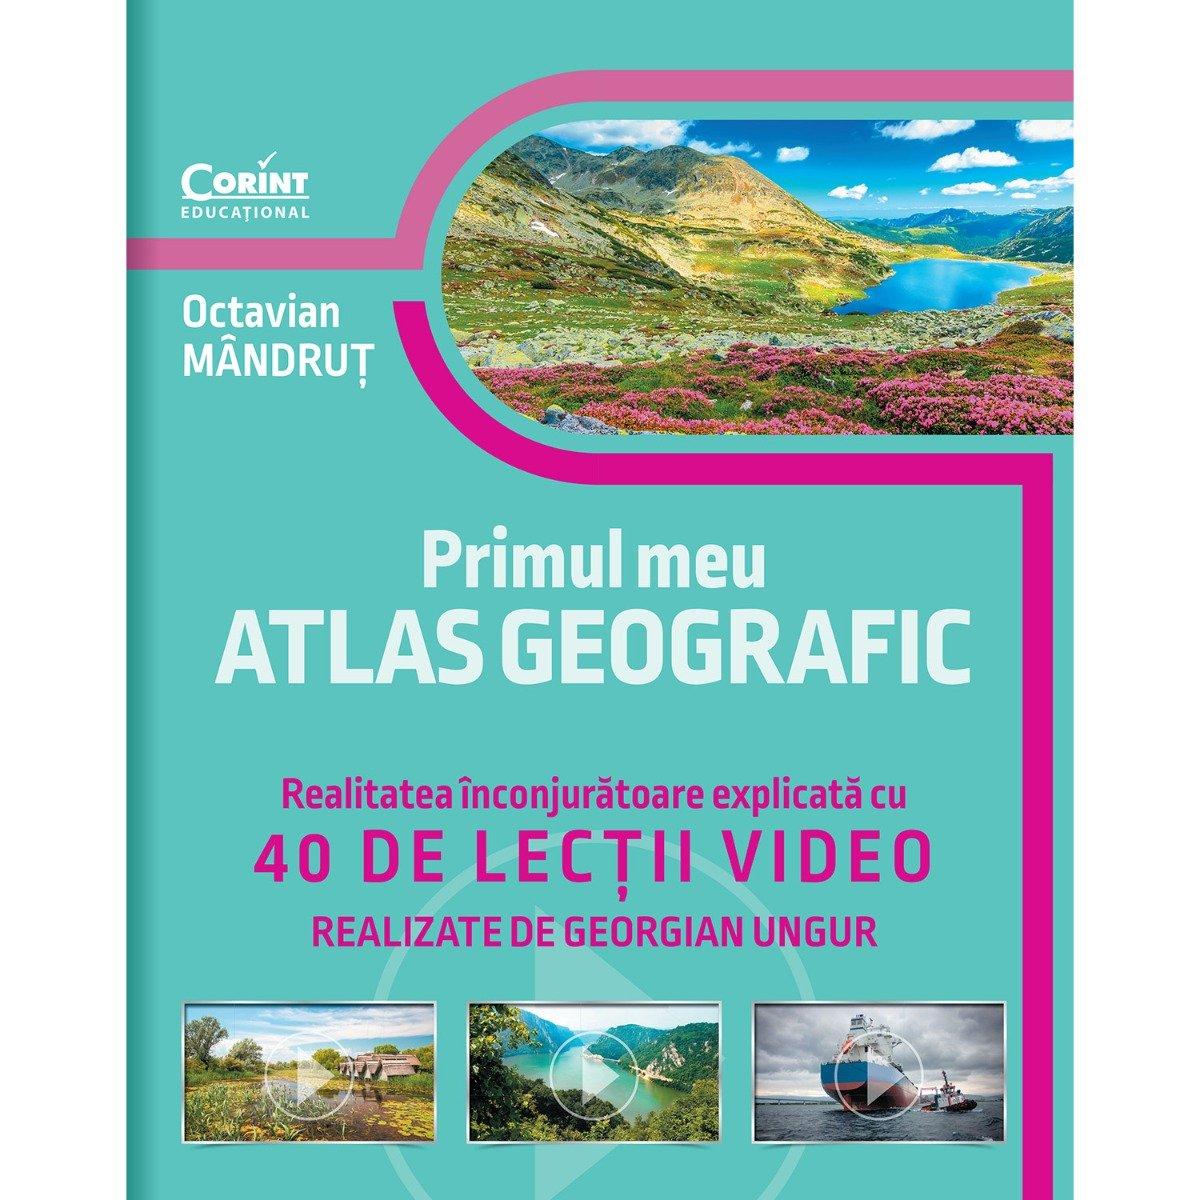 Primul meu atlas geografic, 40 de lectii video, Octavian Mandrut